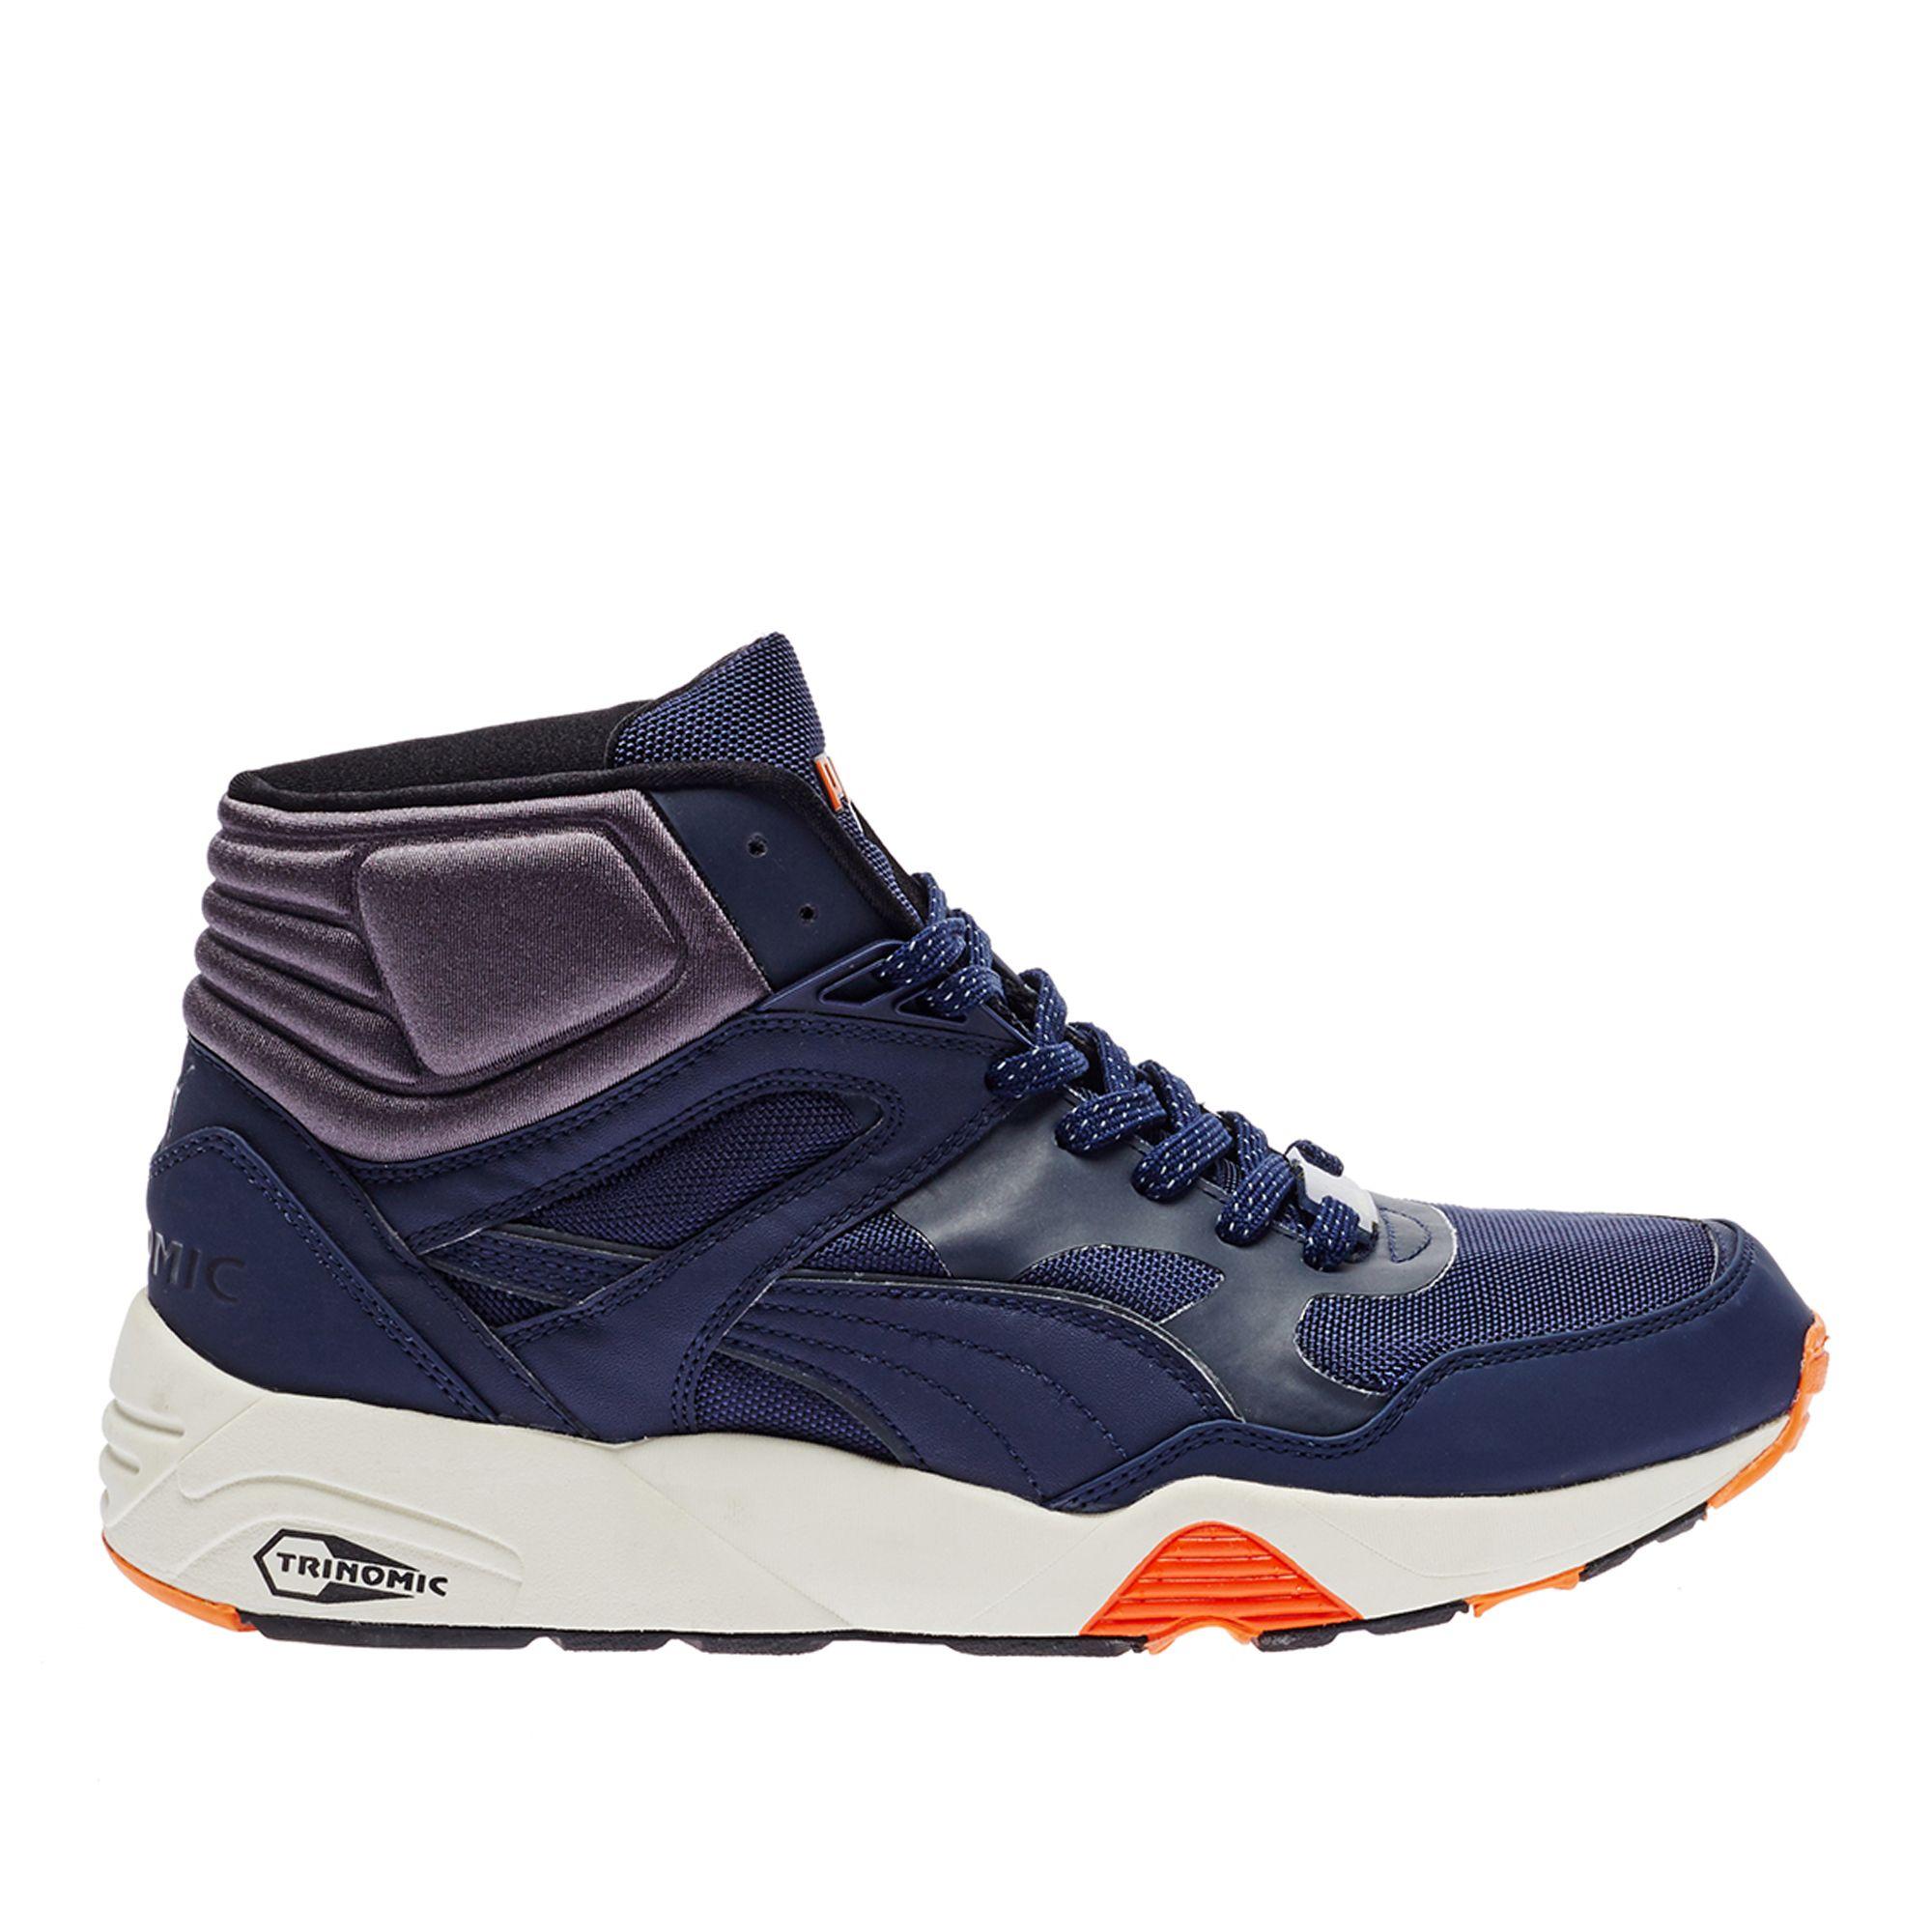 Tops Puma Details New Sneakers Unisex About R698 Winter Sport Trinomic High Classics Footwear fYbg7y6